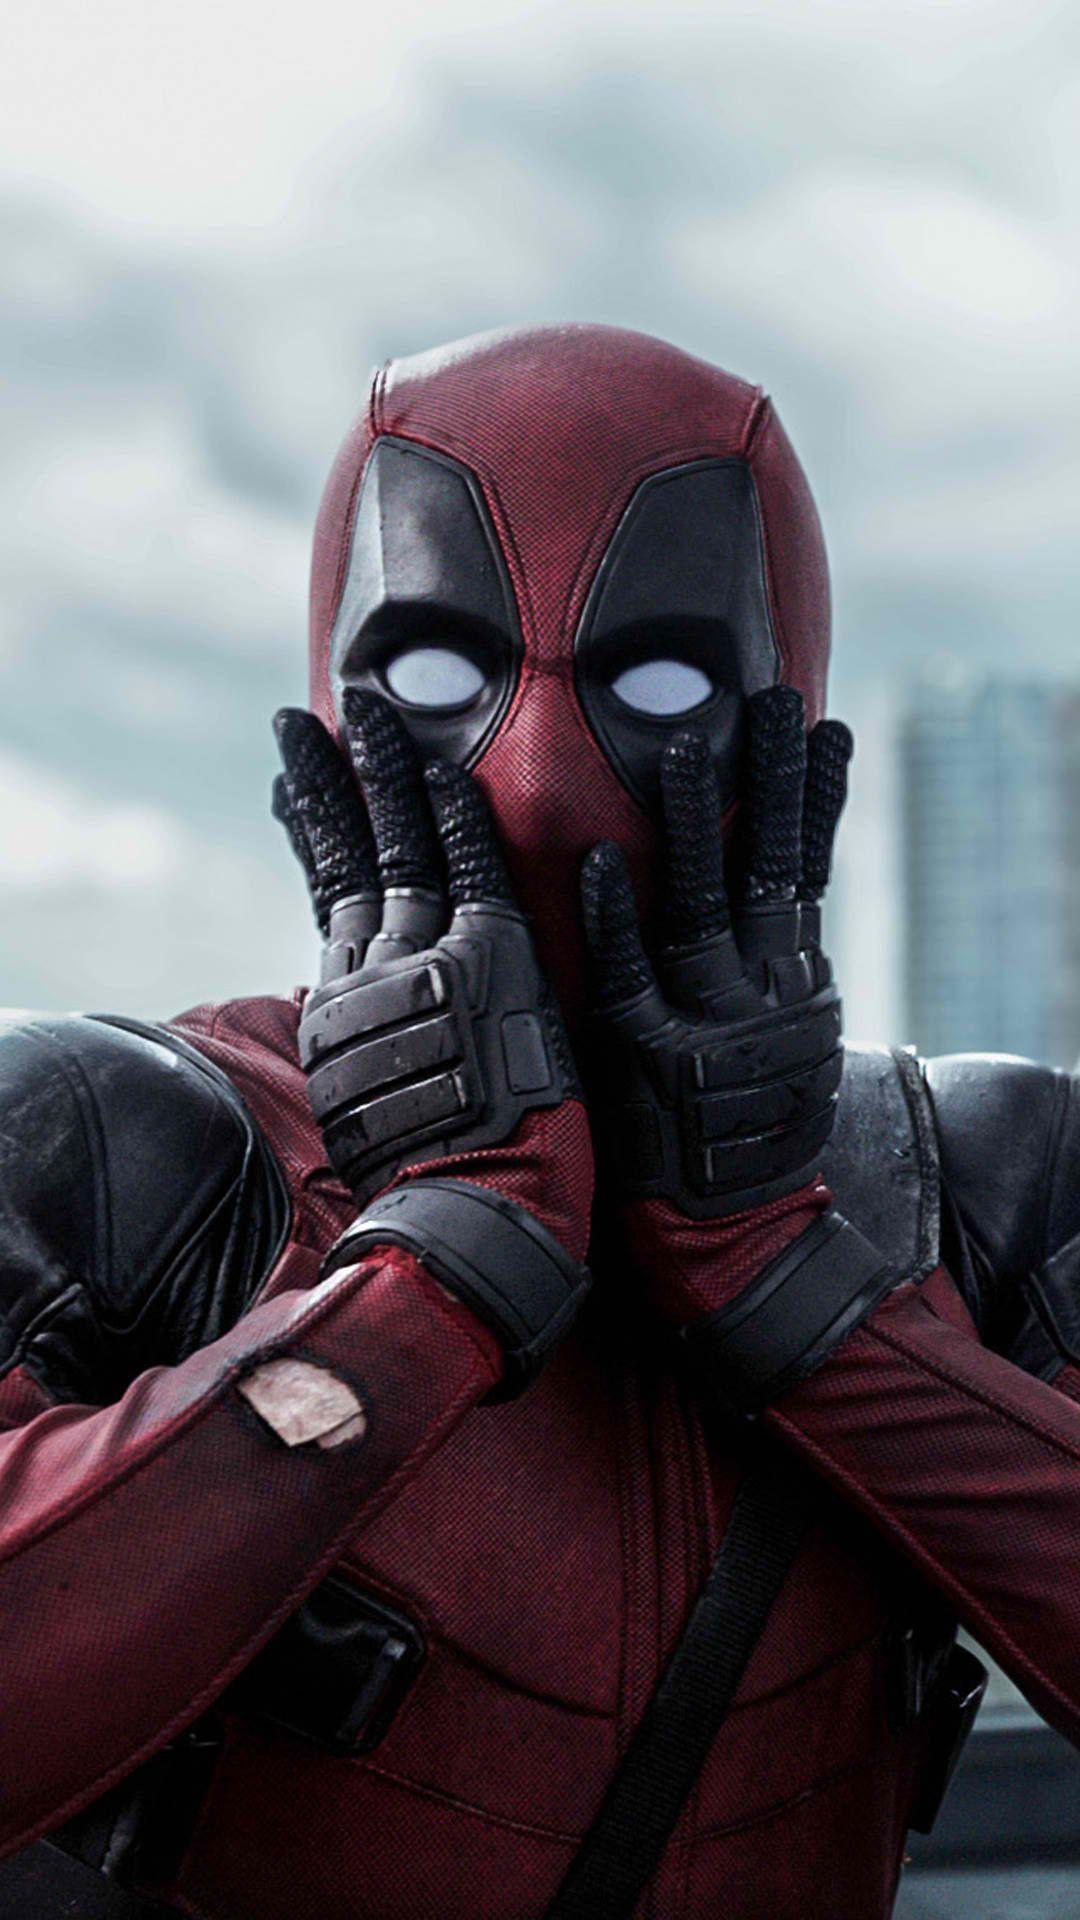 Deadpool Movie Logo Hd Wallpapers On Wallpaperdog